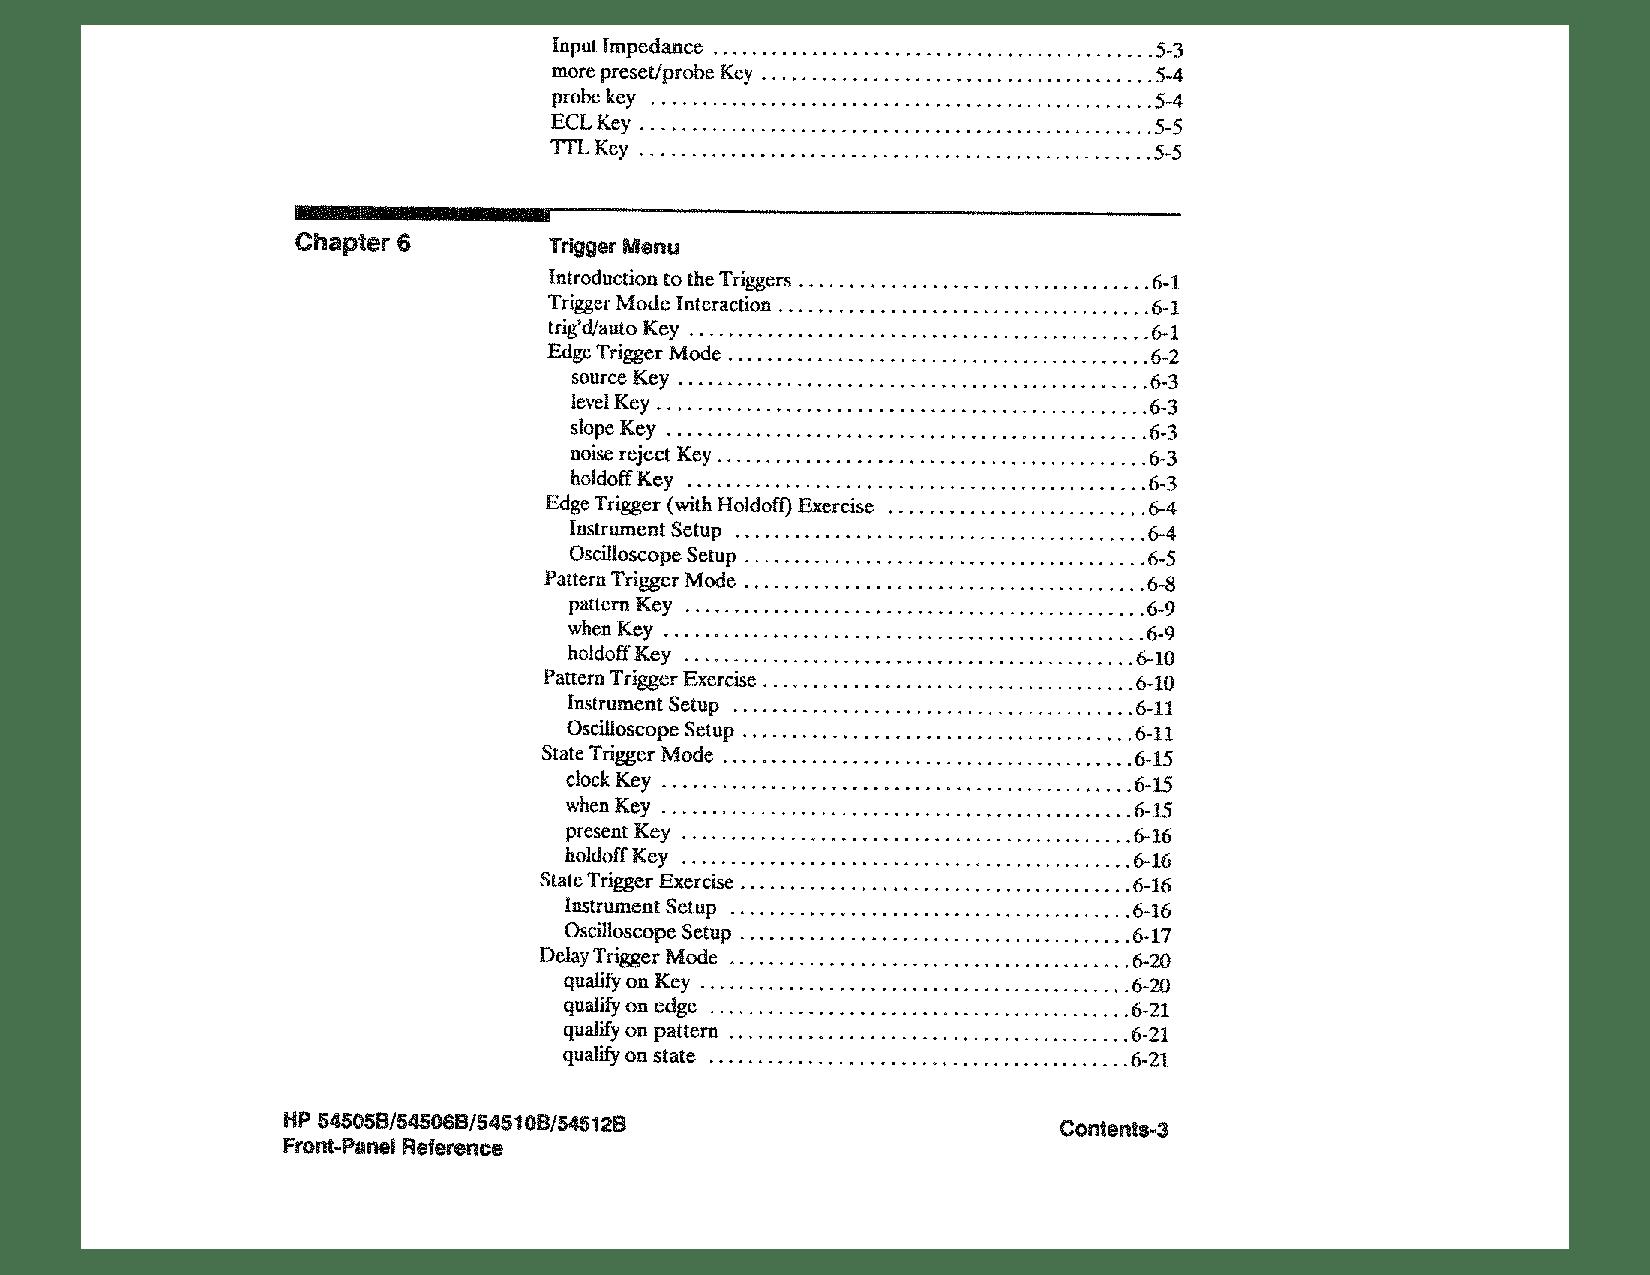 HP (Hewlett-Packard) 54510B, 54505B, 54512B, 54506B User